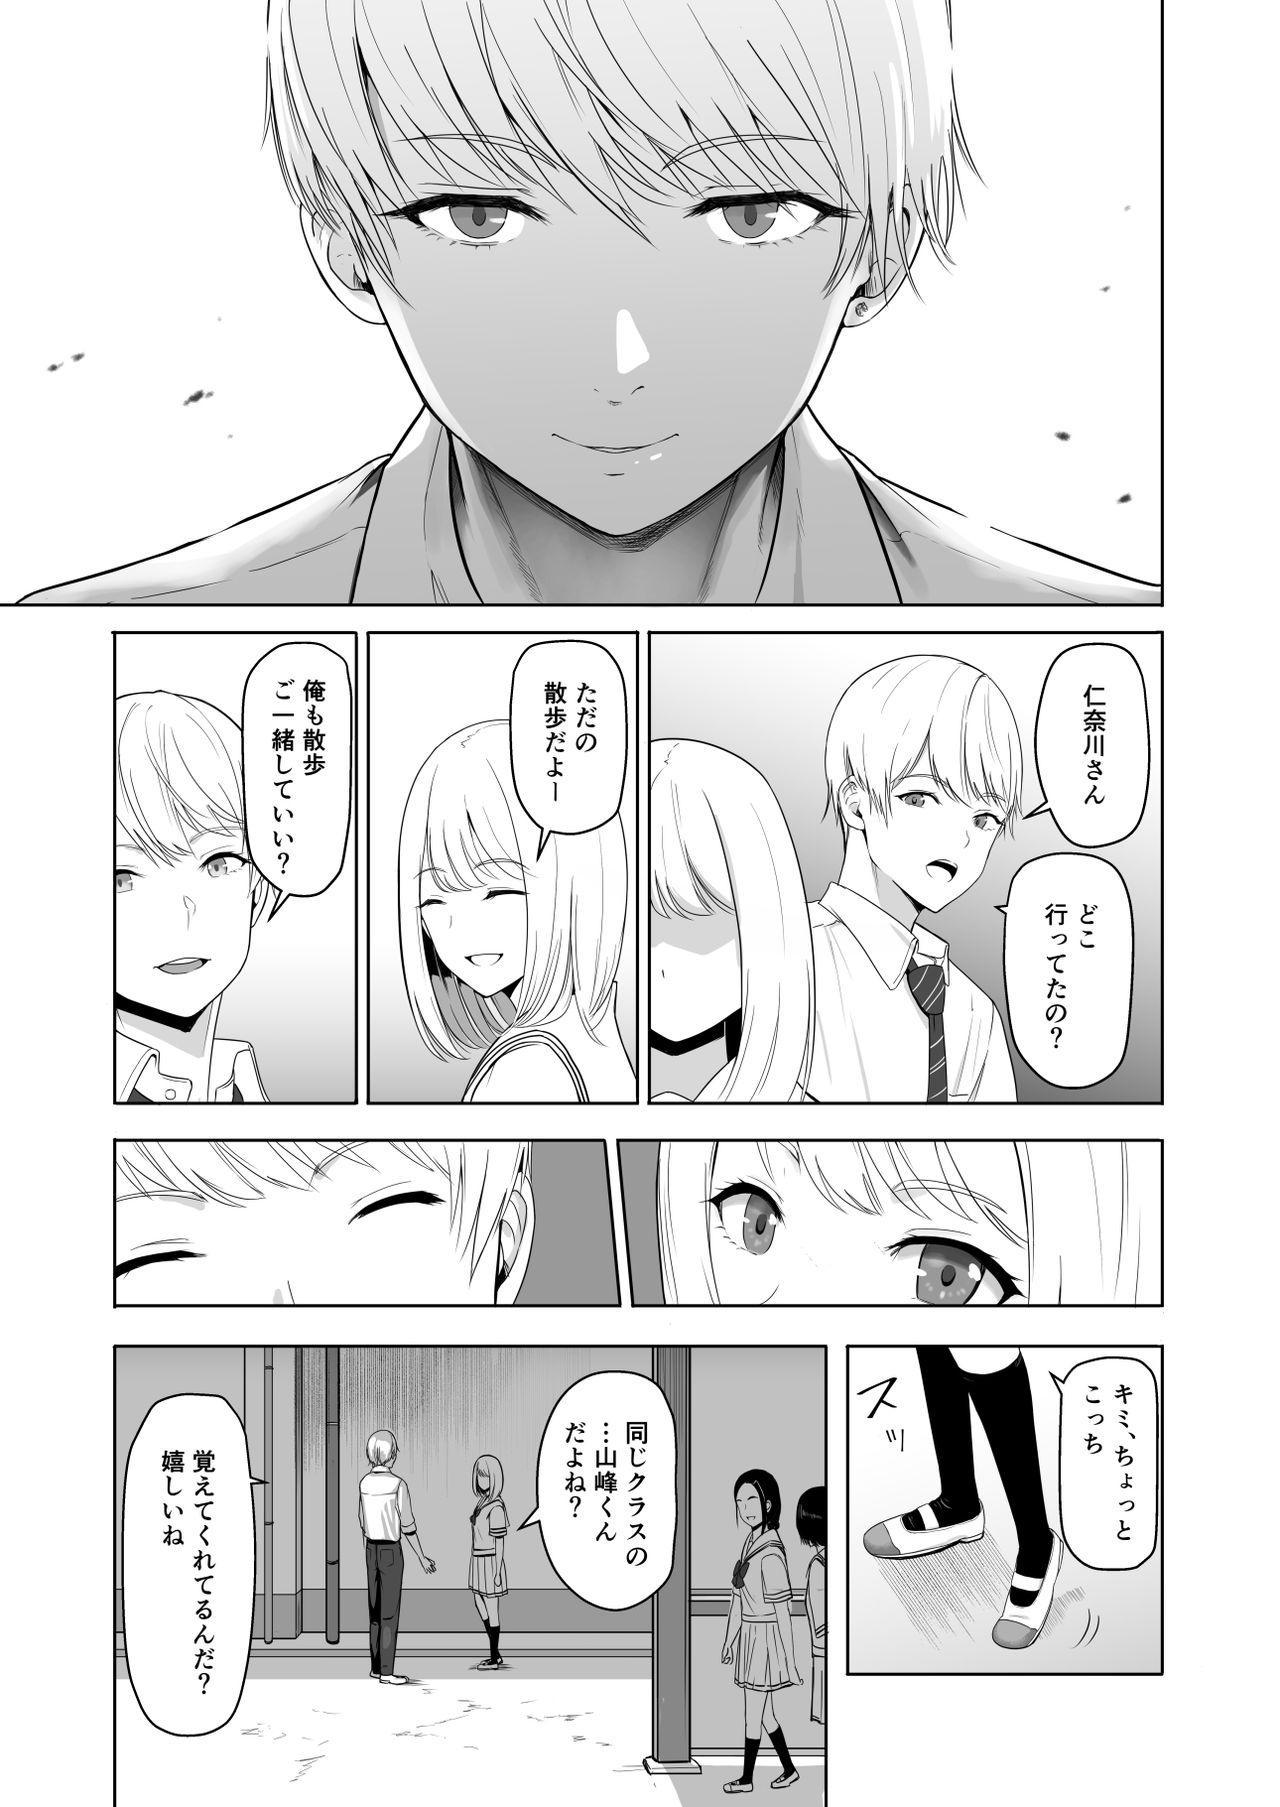 Kimi ga Tame. 2 Ichikawa Inori 25